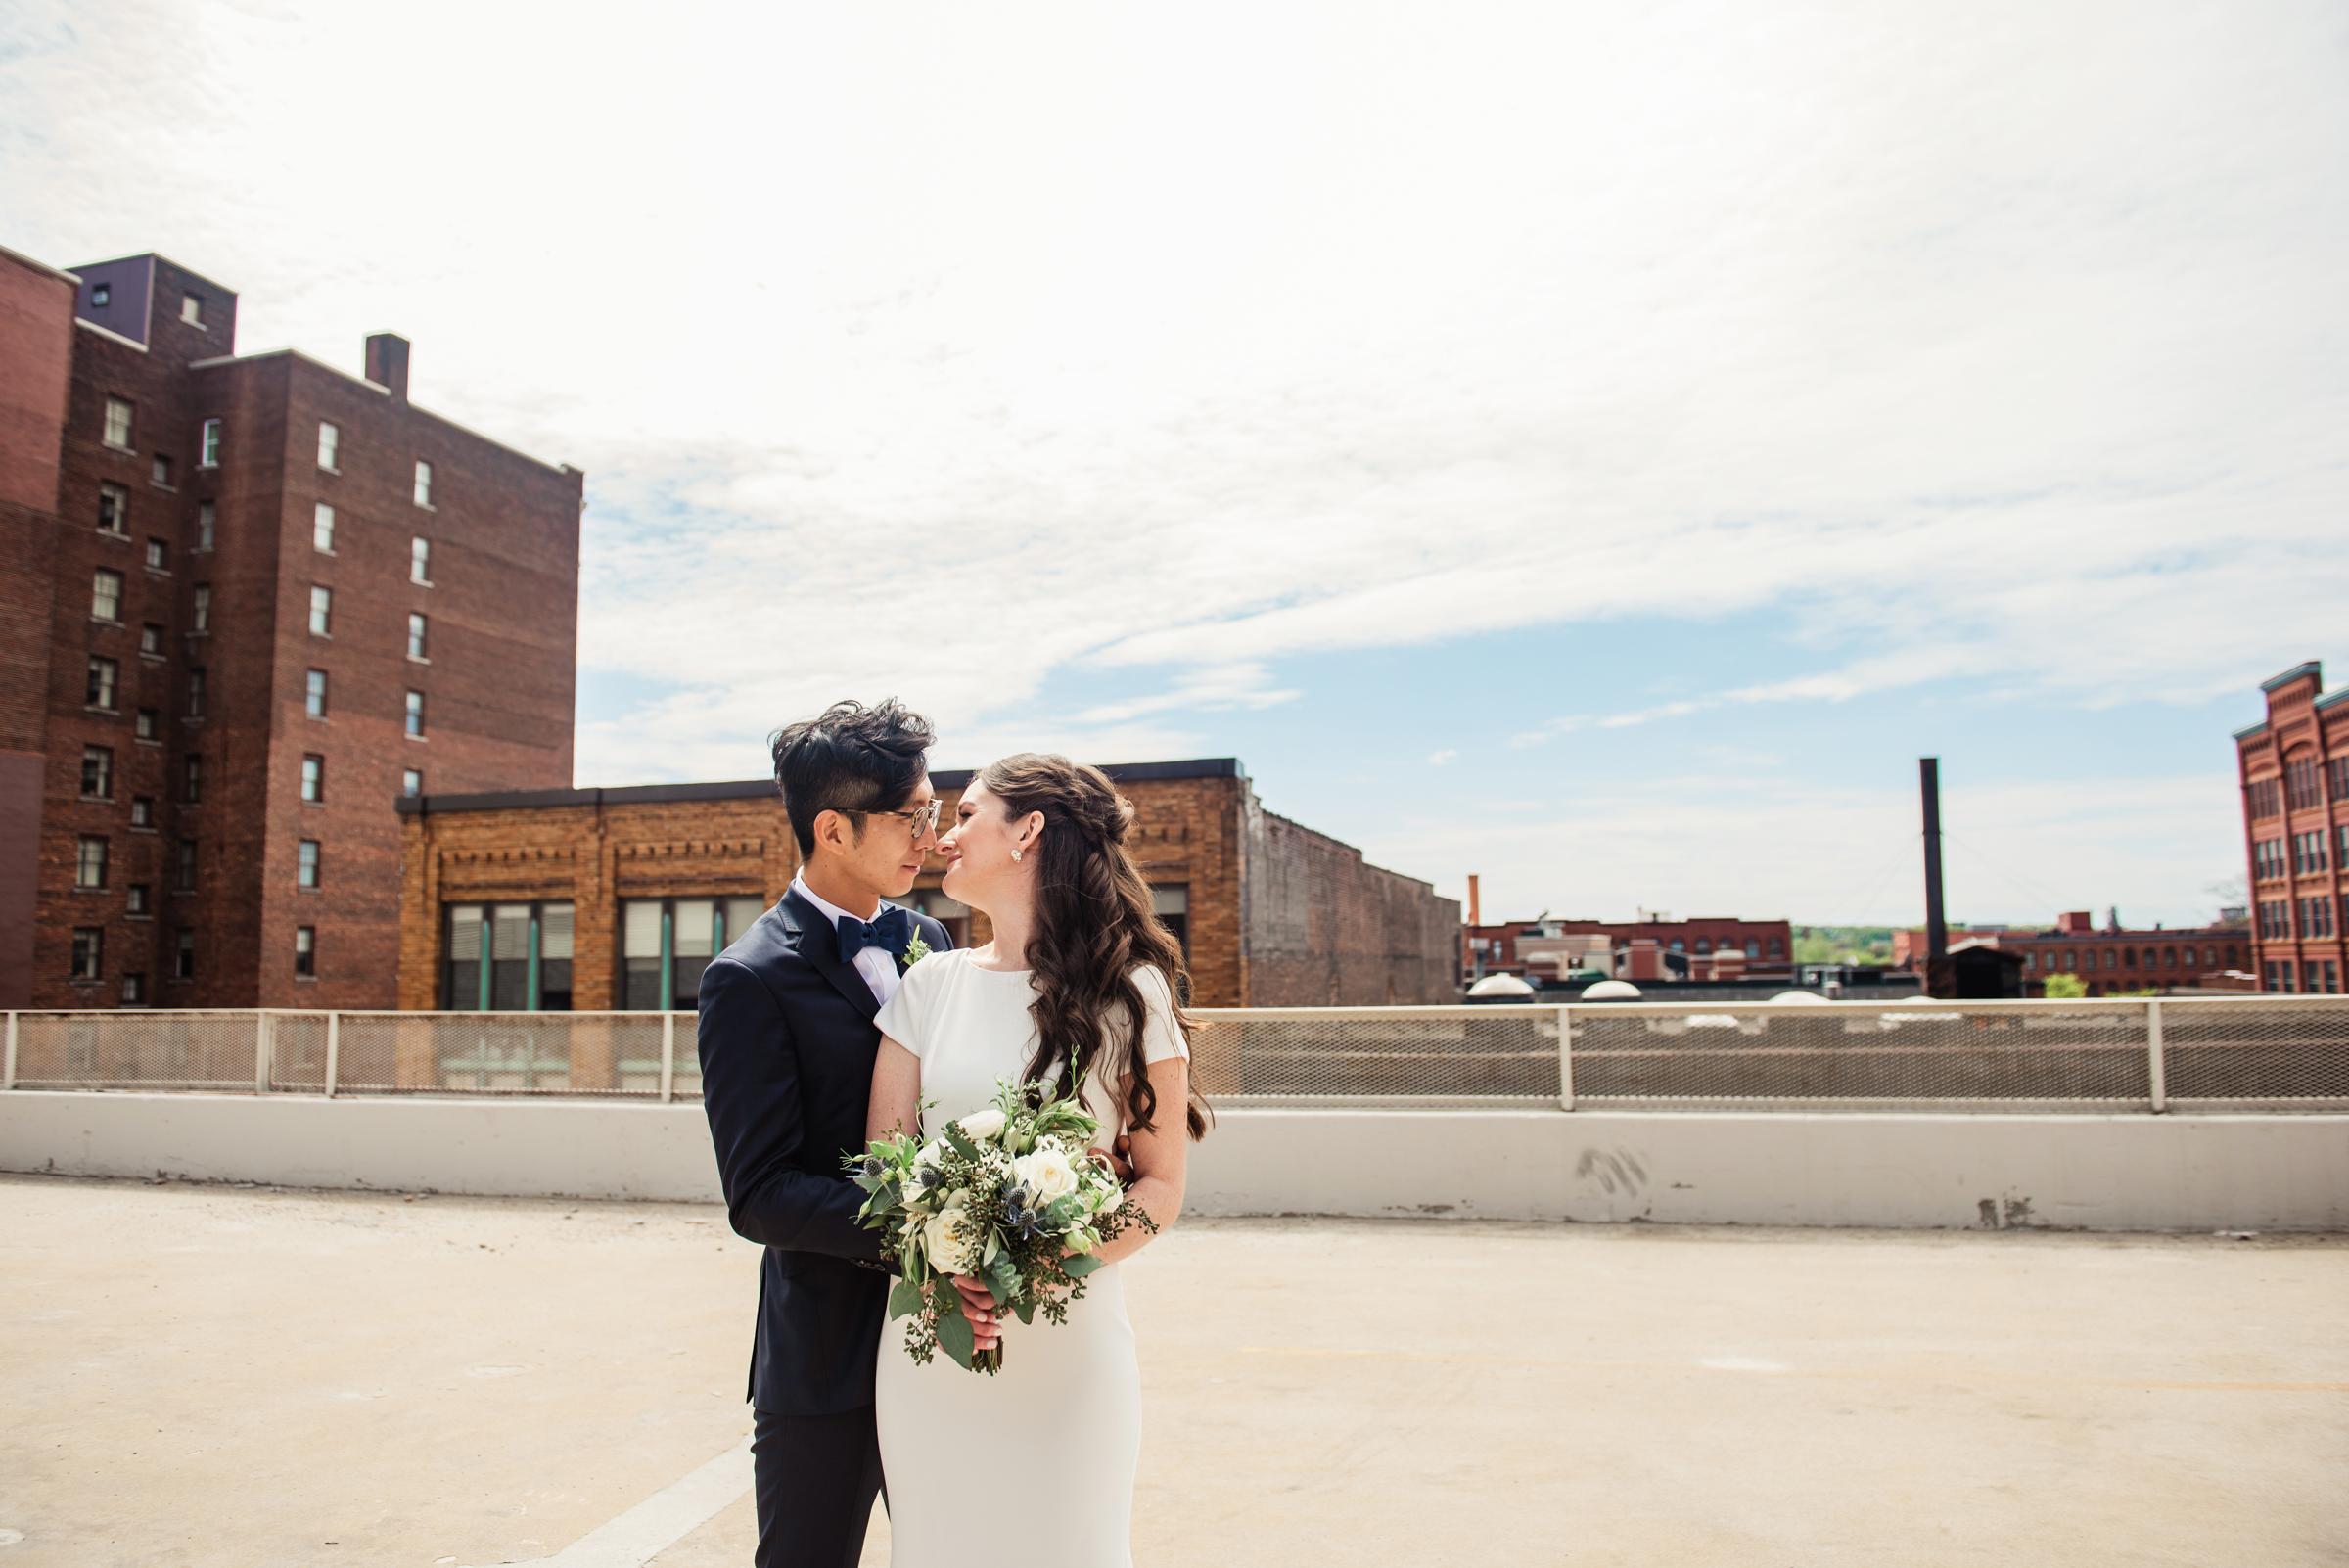 SKY_Armory_Syracuse_Wedding_JILL_STUDIO_Rochester_NY_Photographer_DSC_5291.jpg